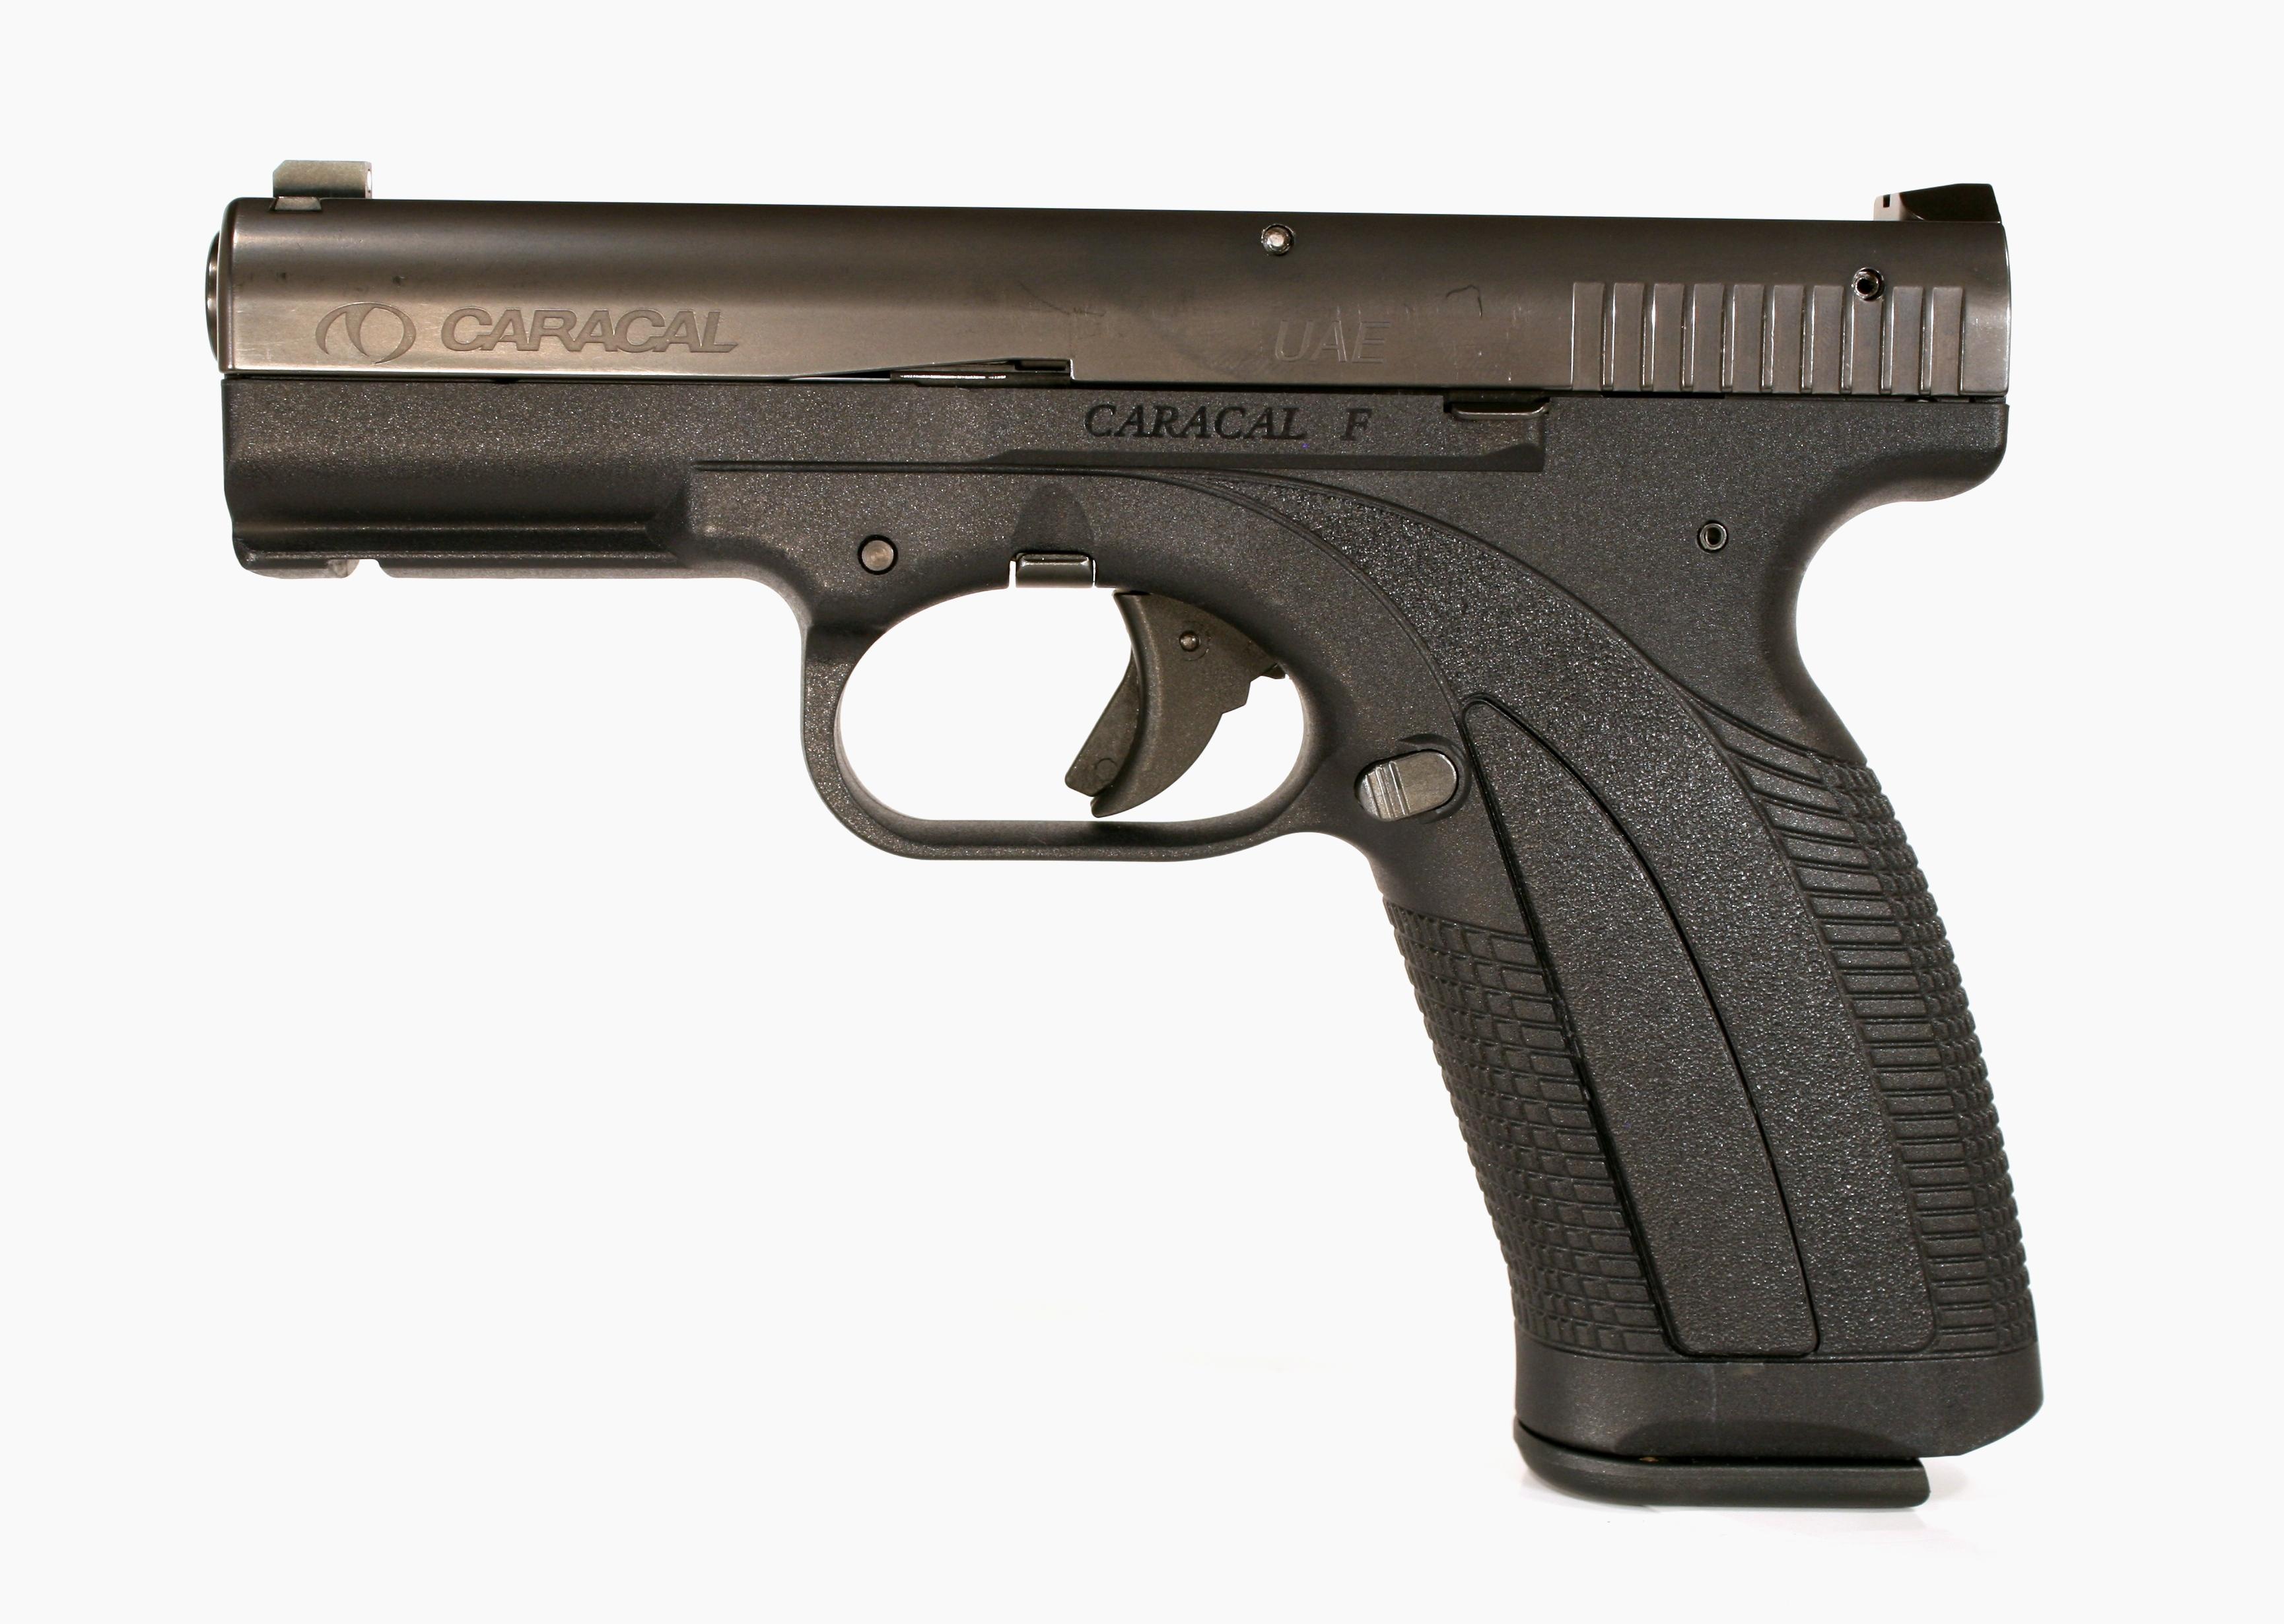 Foto de pistola caracal 24